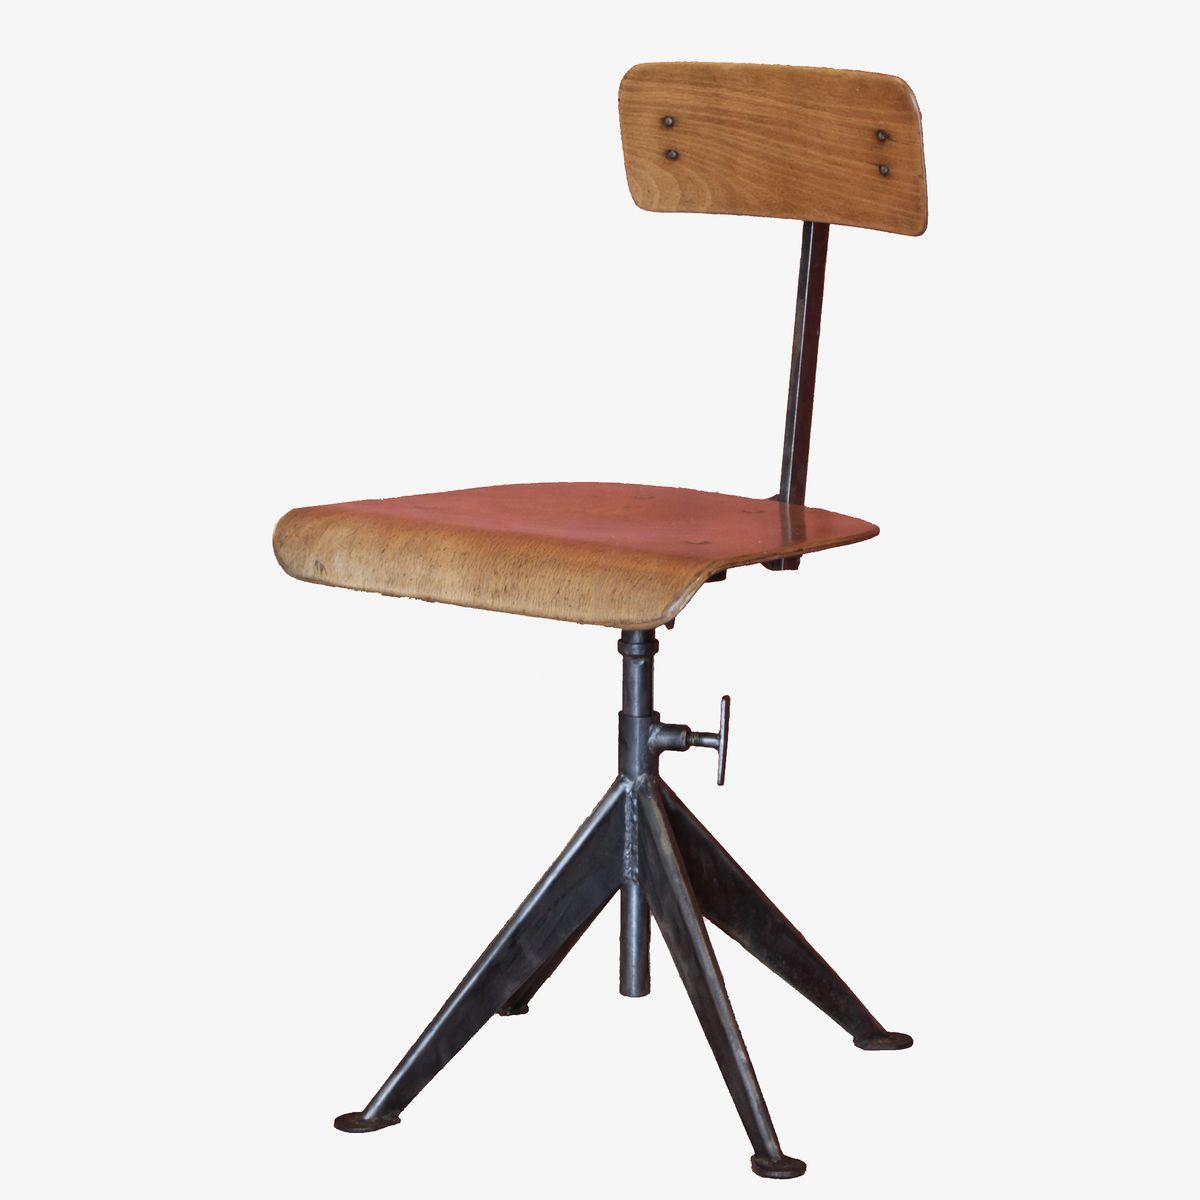 vintage office swivel chair by jean prouve 10 17 Superbe Chaise originale Hyt4